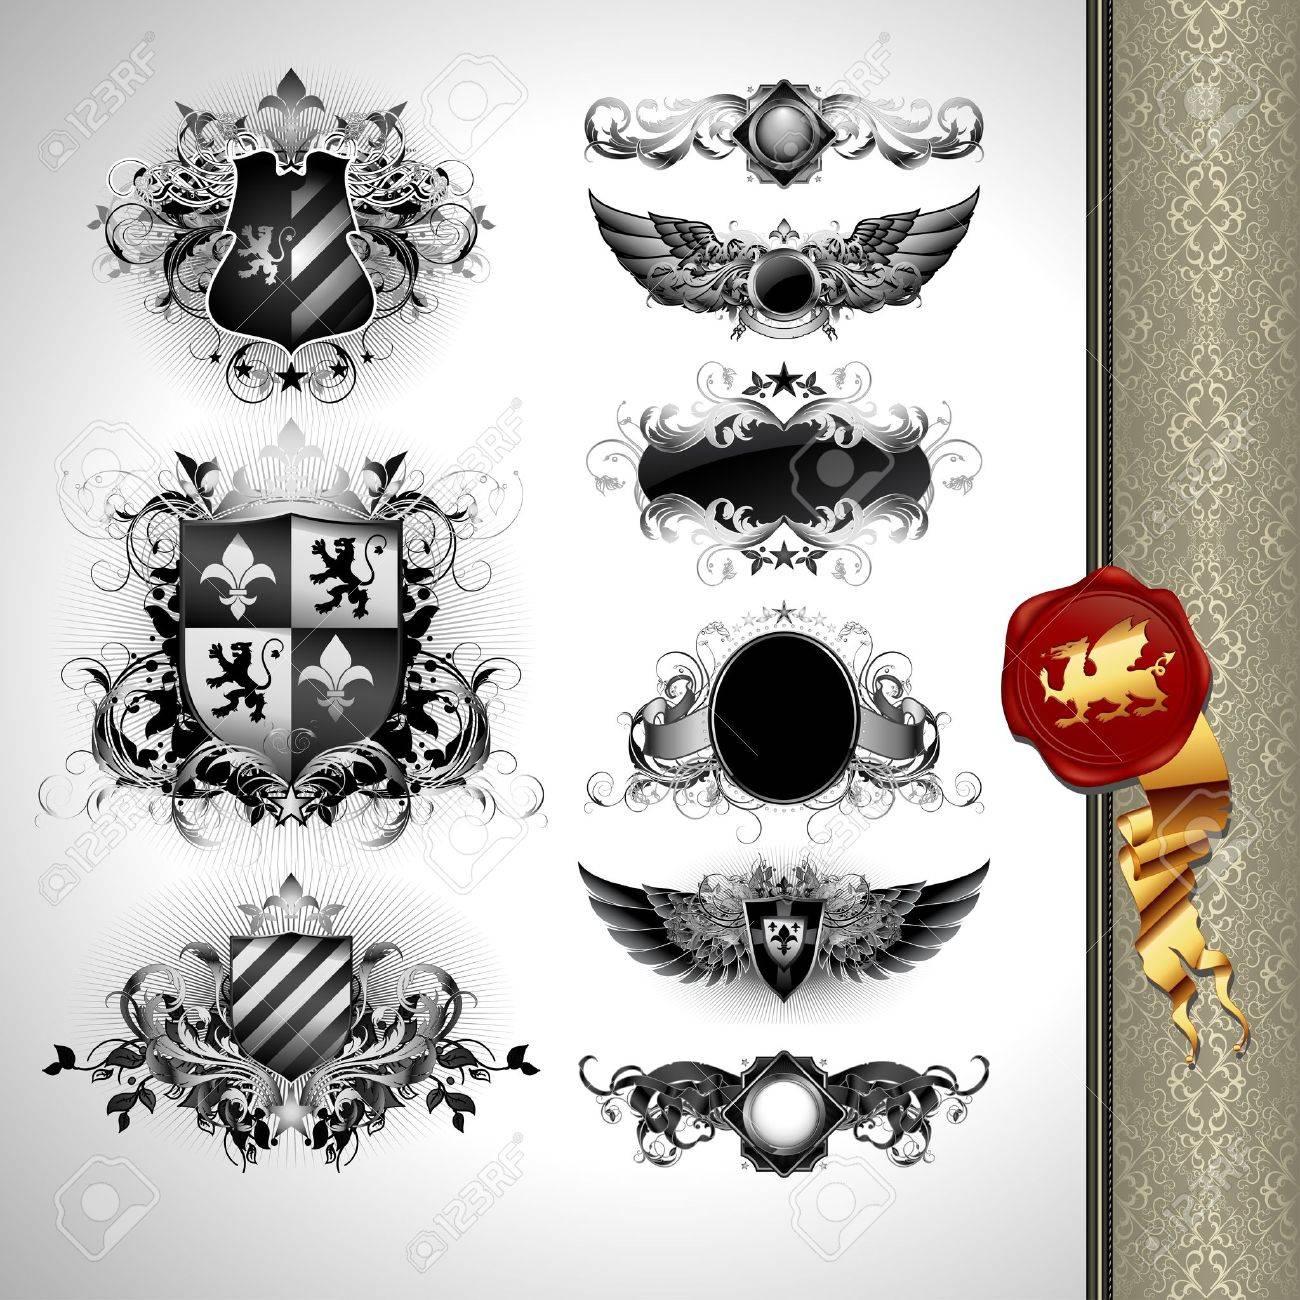 How to breed heraldic dragon - Heraldic Lion Medieval Heraldry Shields